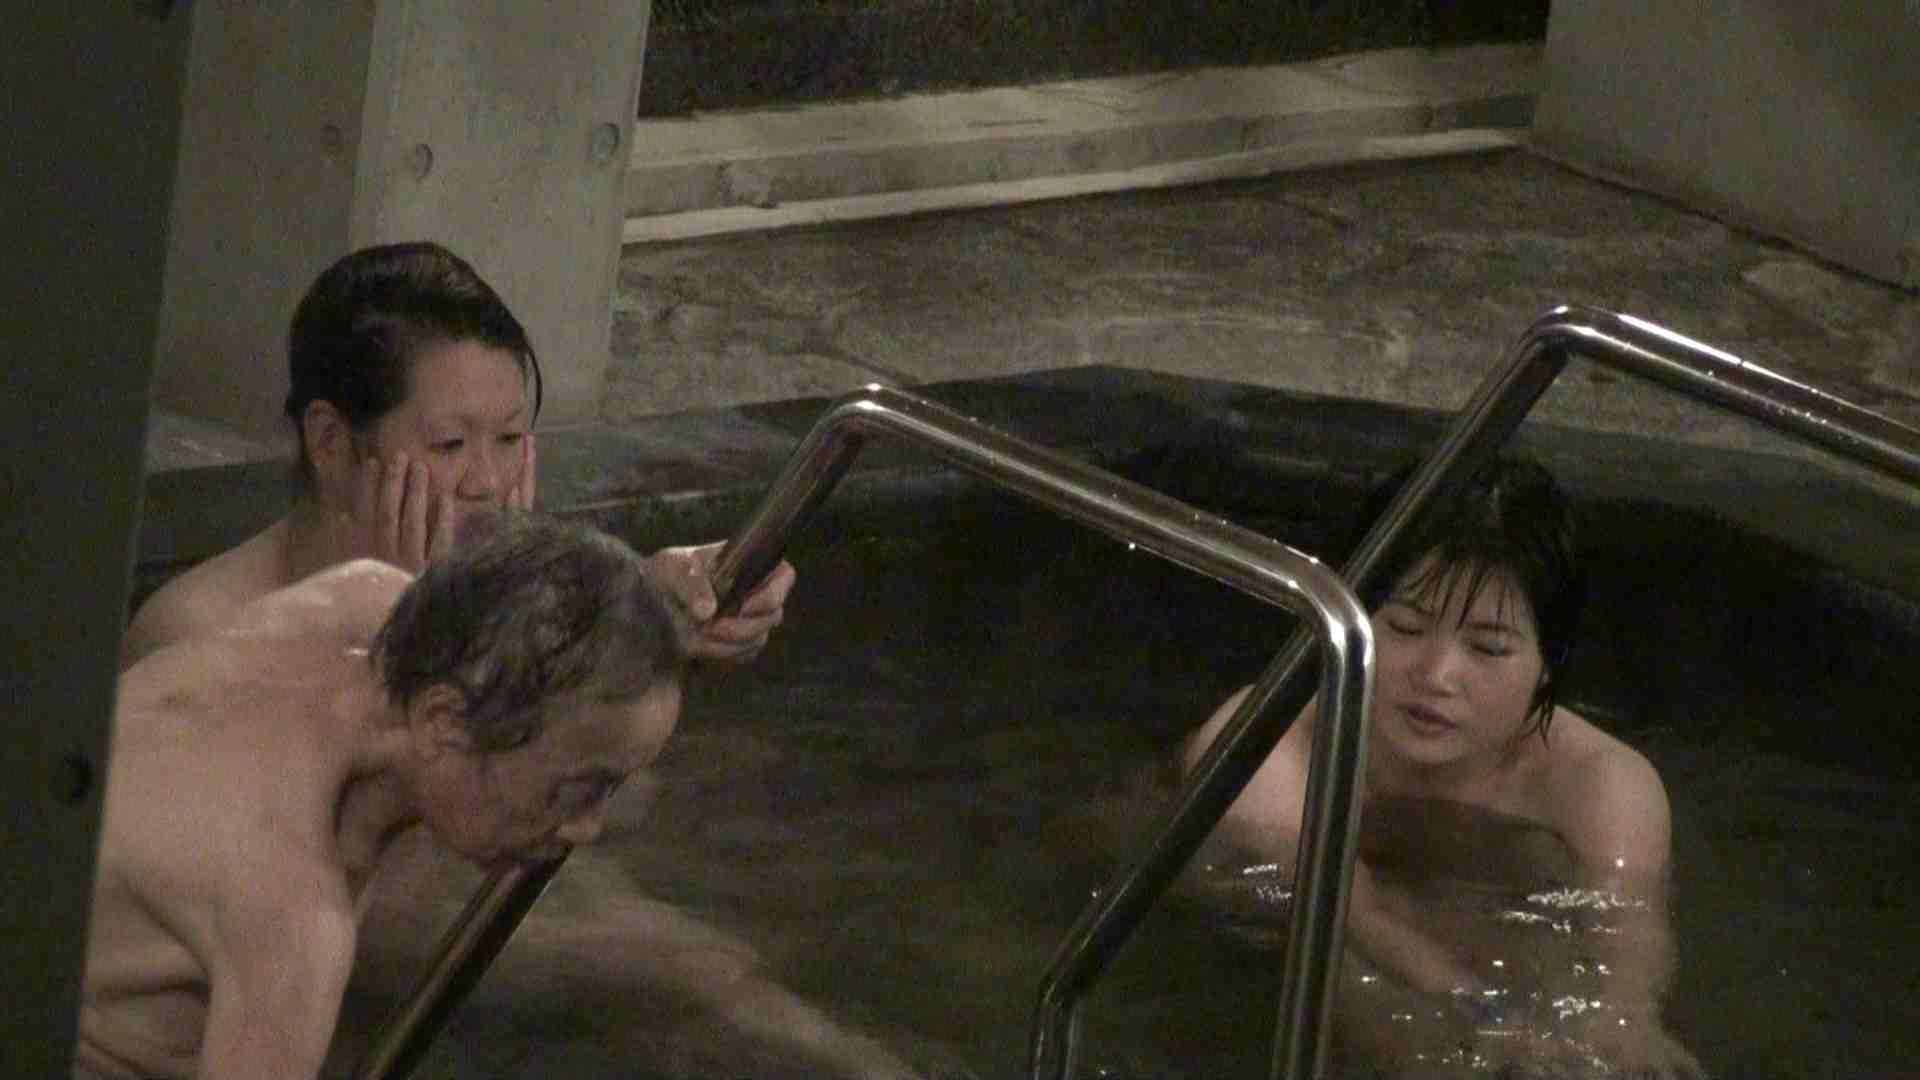 Aquaな露天風呂Vol.384 OL女体  82連発 63